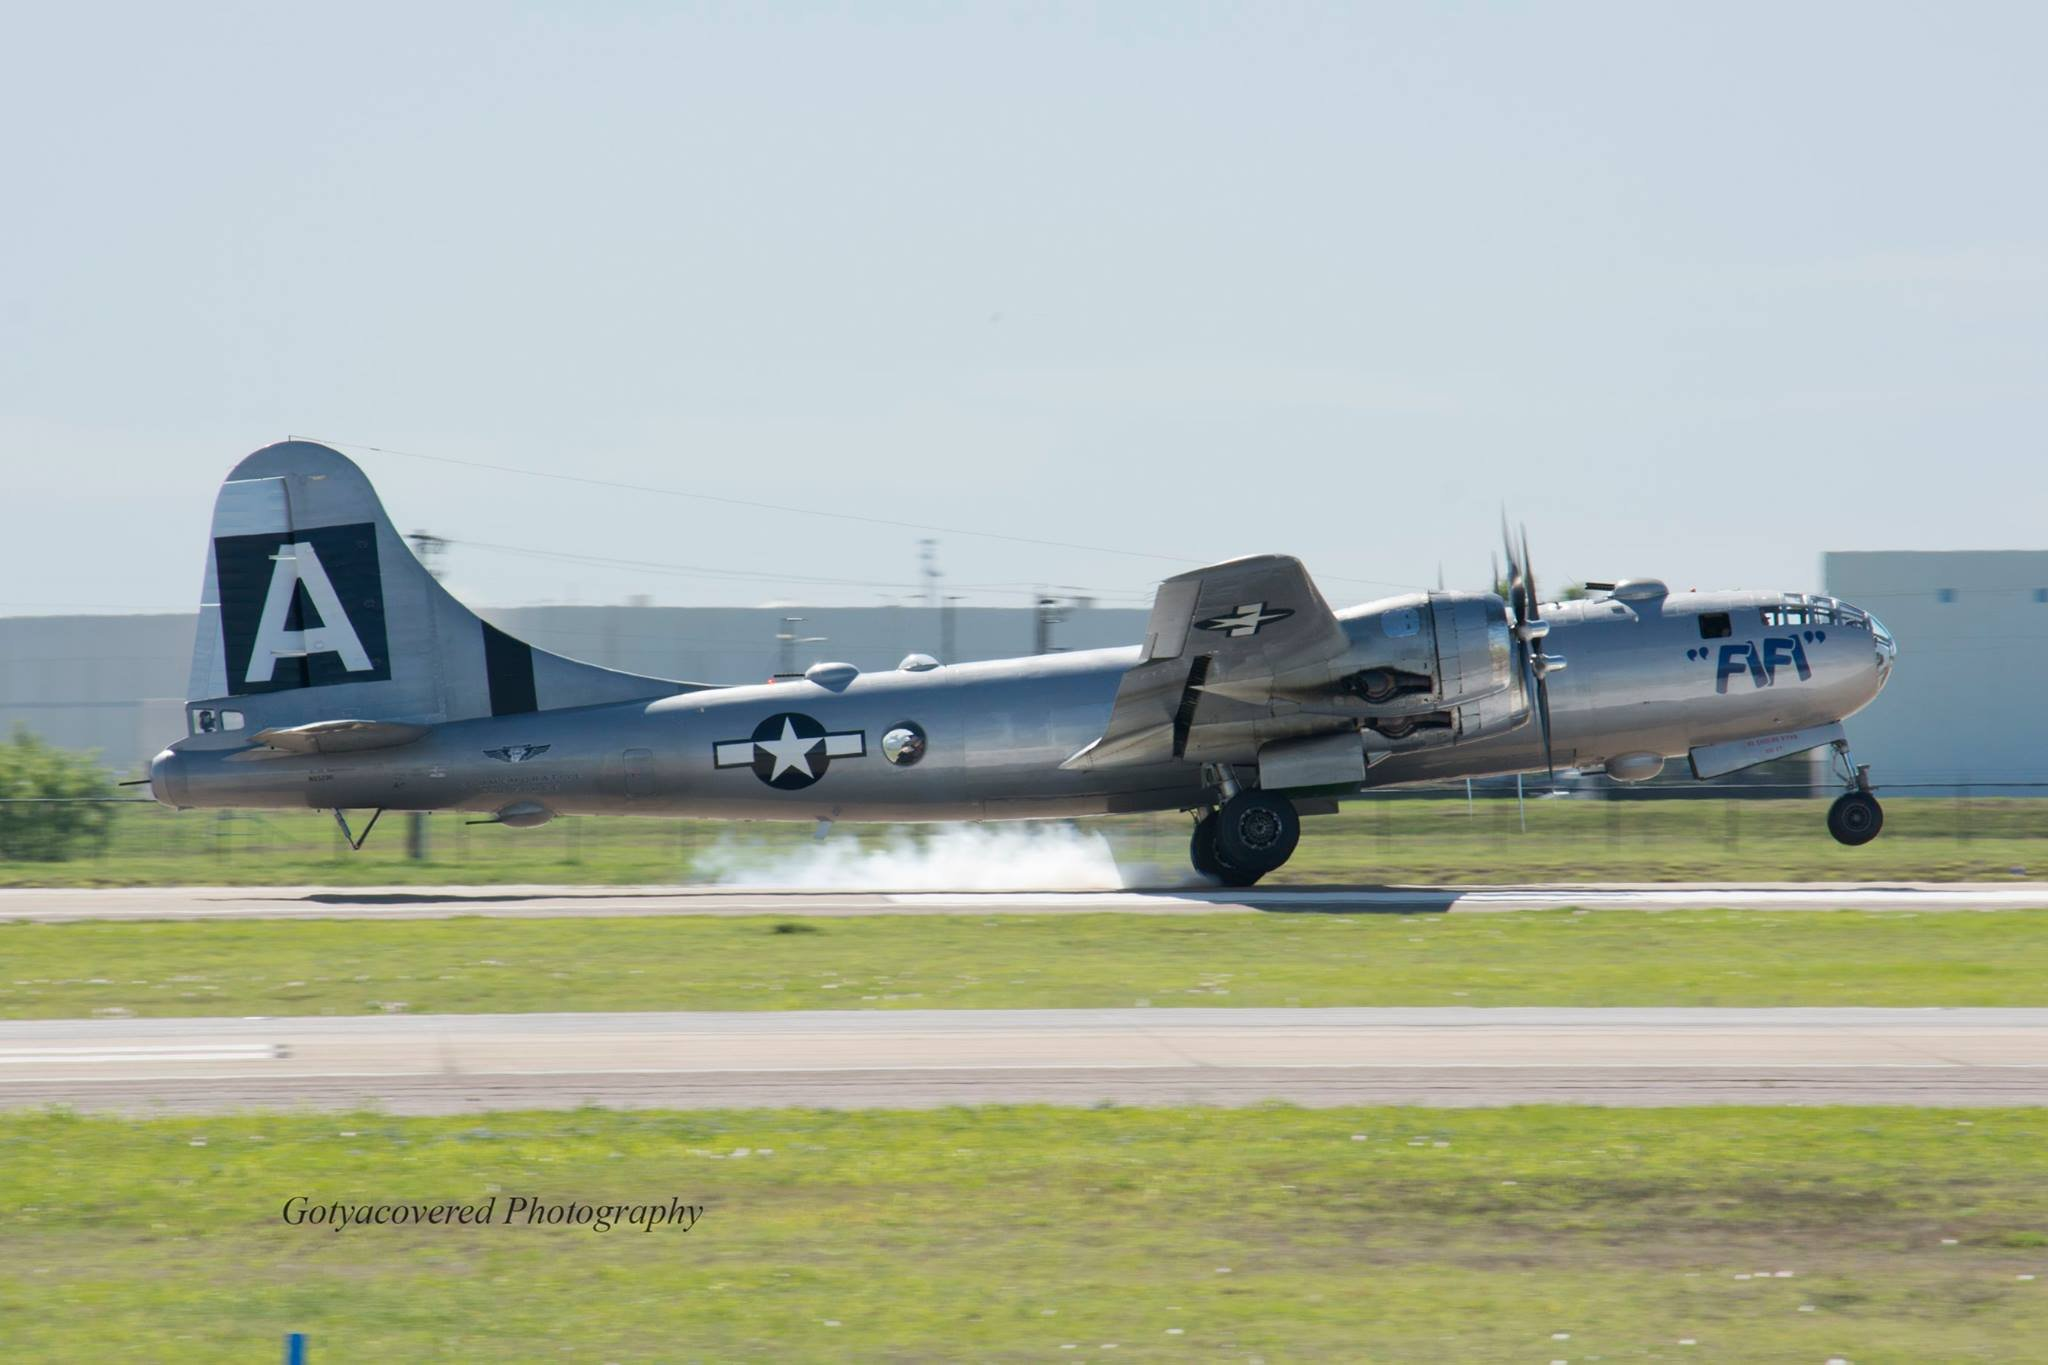 (Source: Commemorative Air Force B29 B24 Squadron via Facebook)